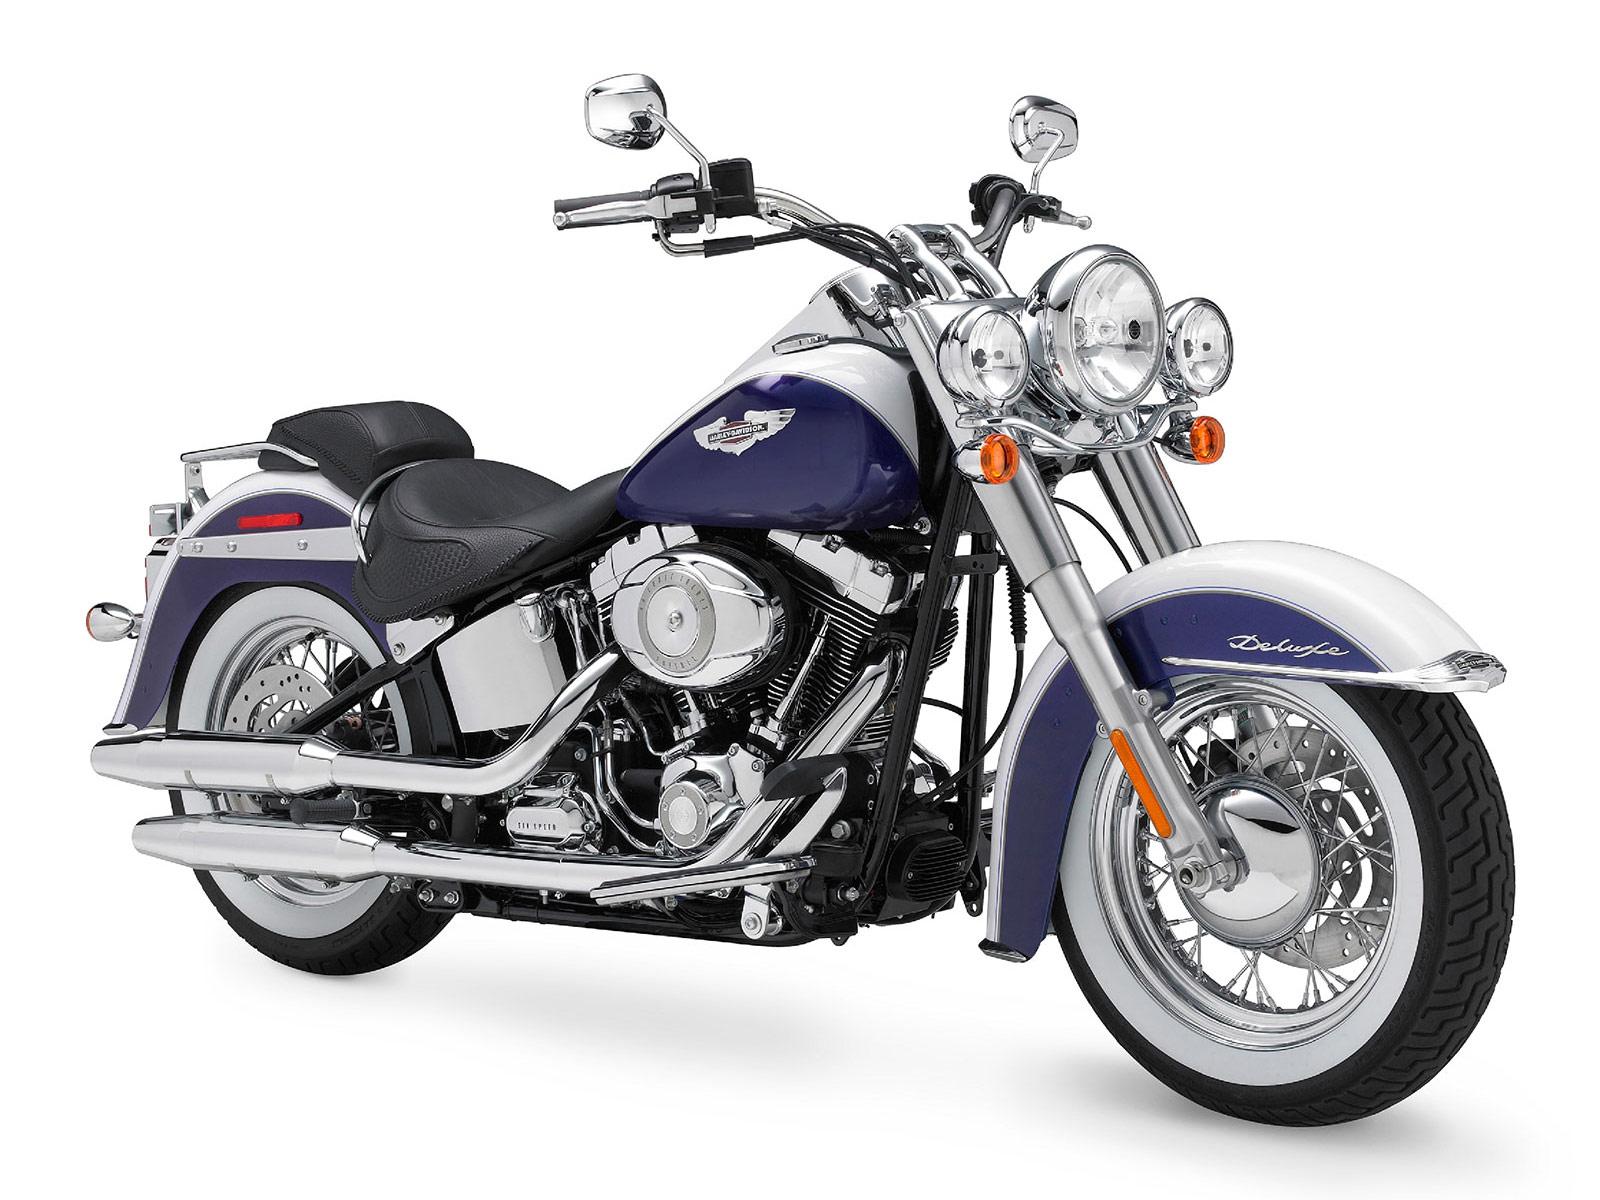 http://4.bp.blogspot.com/_7OBlGXSTB6s/S6y1cnePLBI/AAAAAAAABmc/EEoBRn7px8E/s1600/Harley-Davidson_SoftailDeluxe-FLSTN-2010_2.jpg